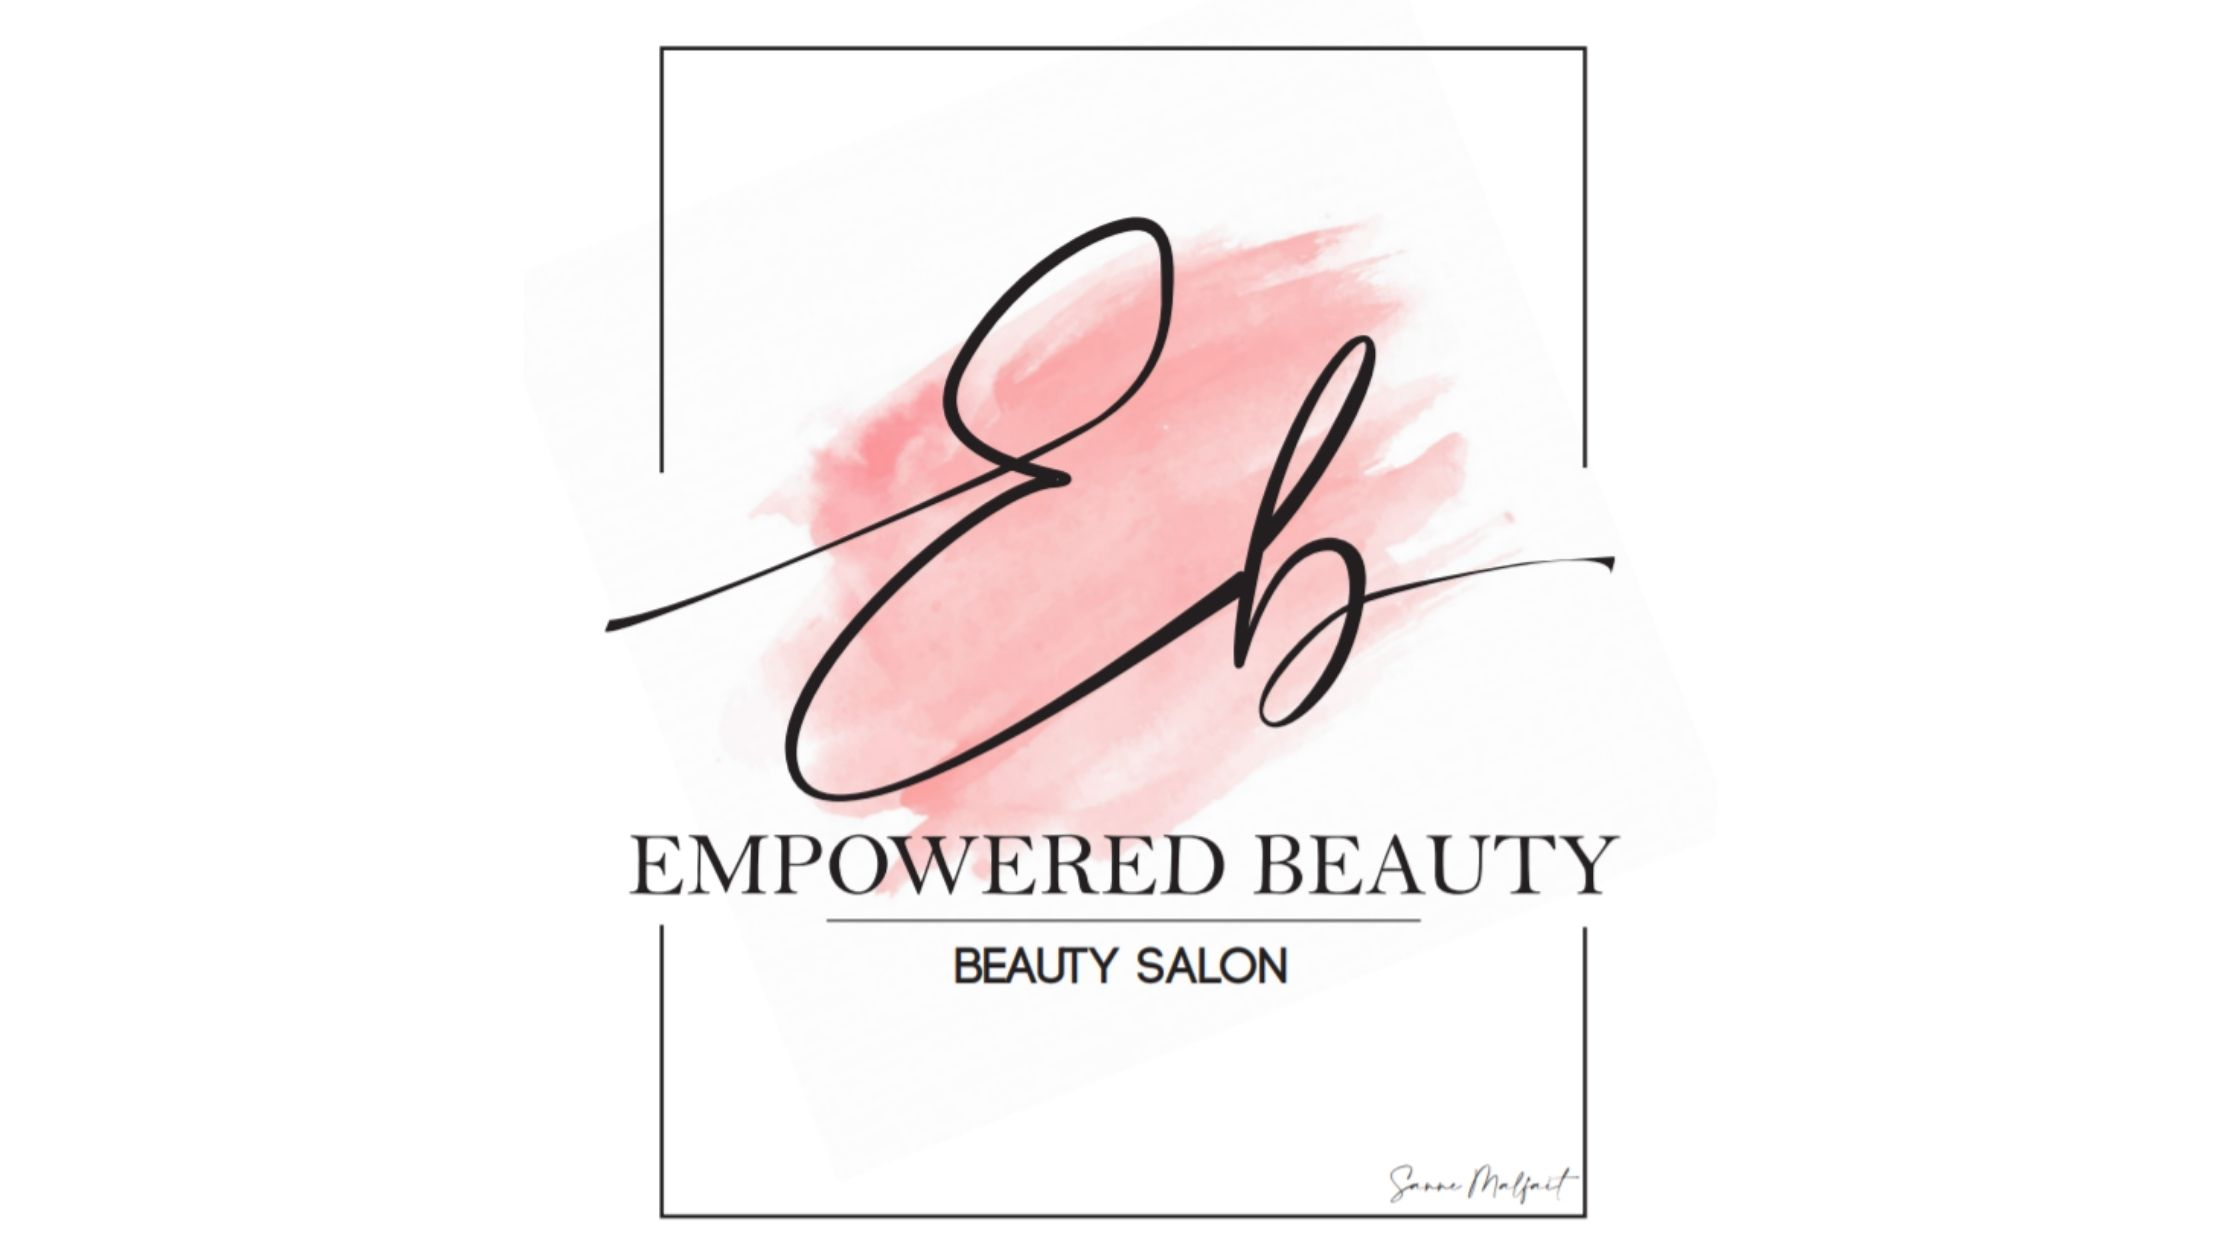 EmpoweredBeauty